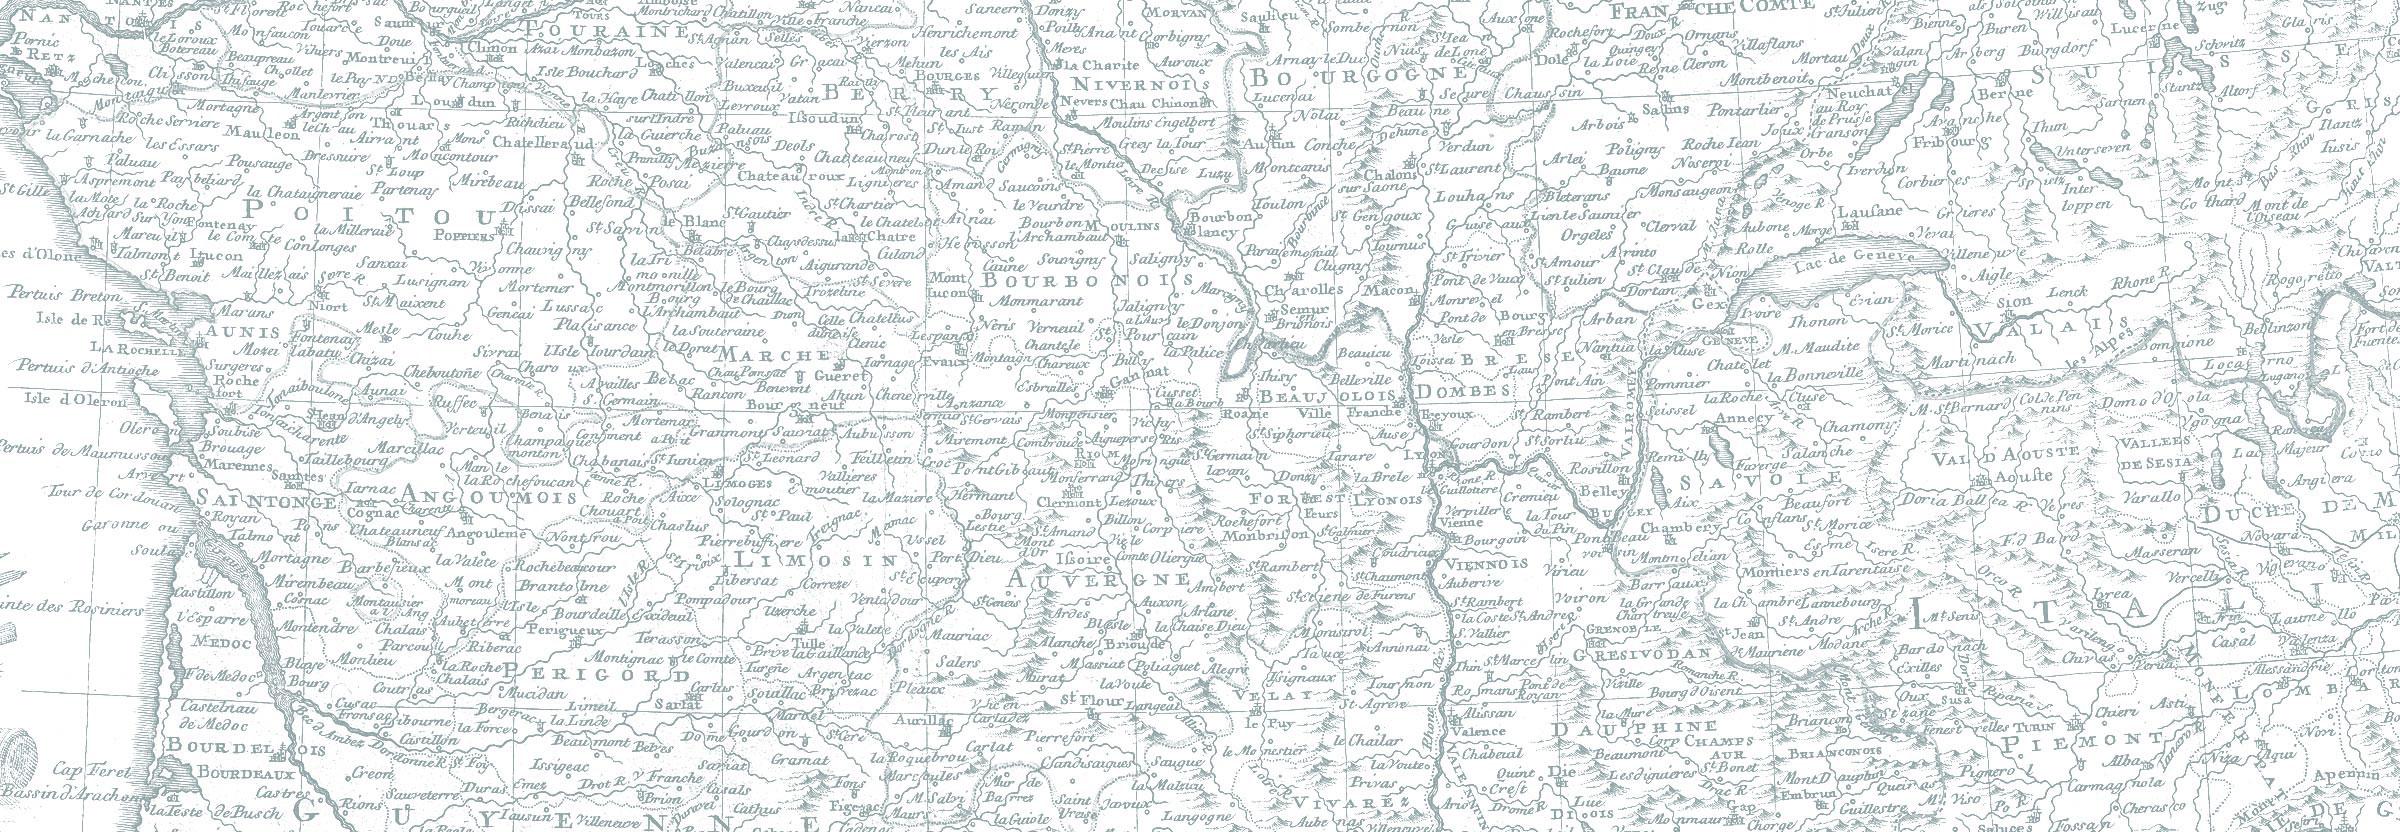 1741-map-france-parallax-2-fade